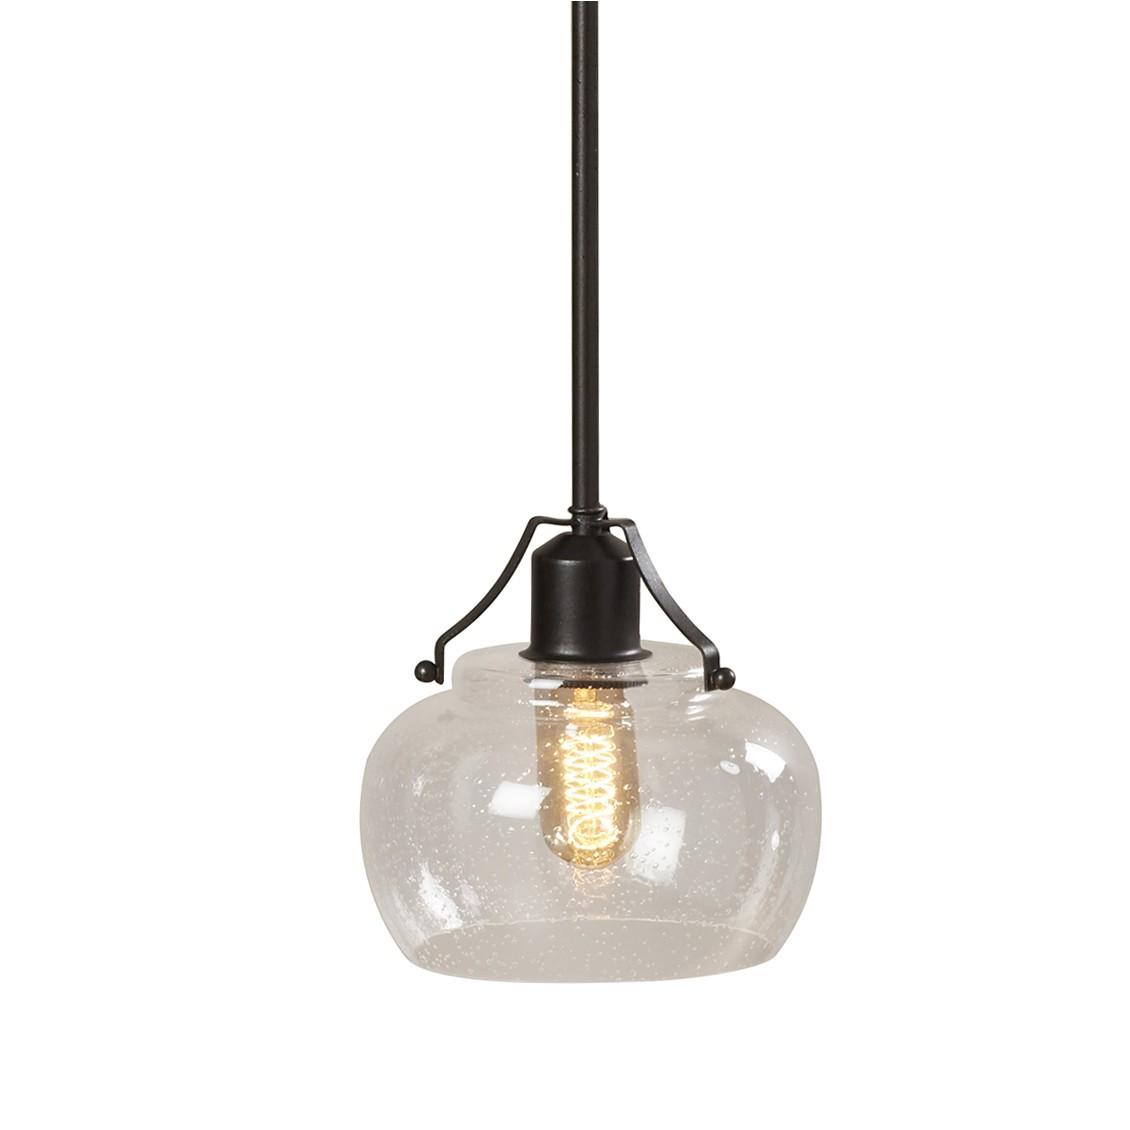 Trent Austin Design Lighting Trent Austin Design Wabanaki 1 Light Mini Pendant